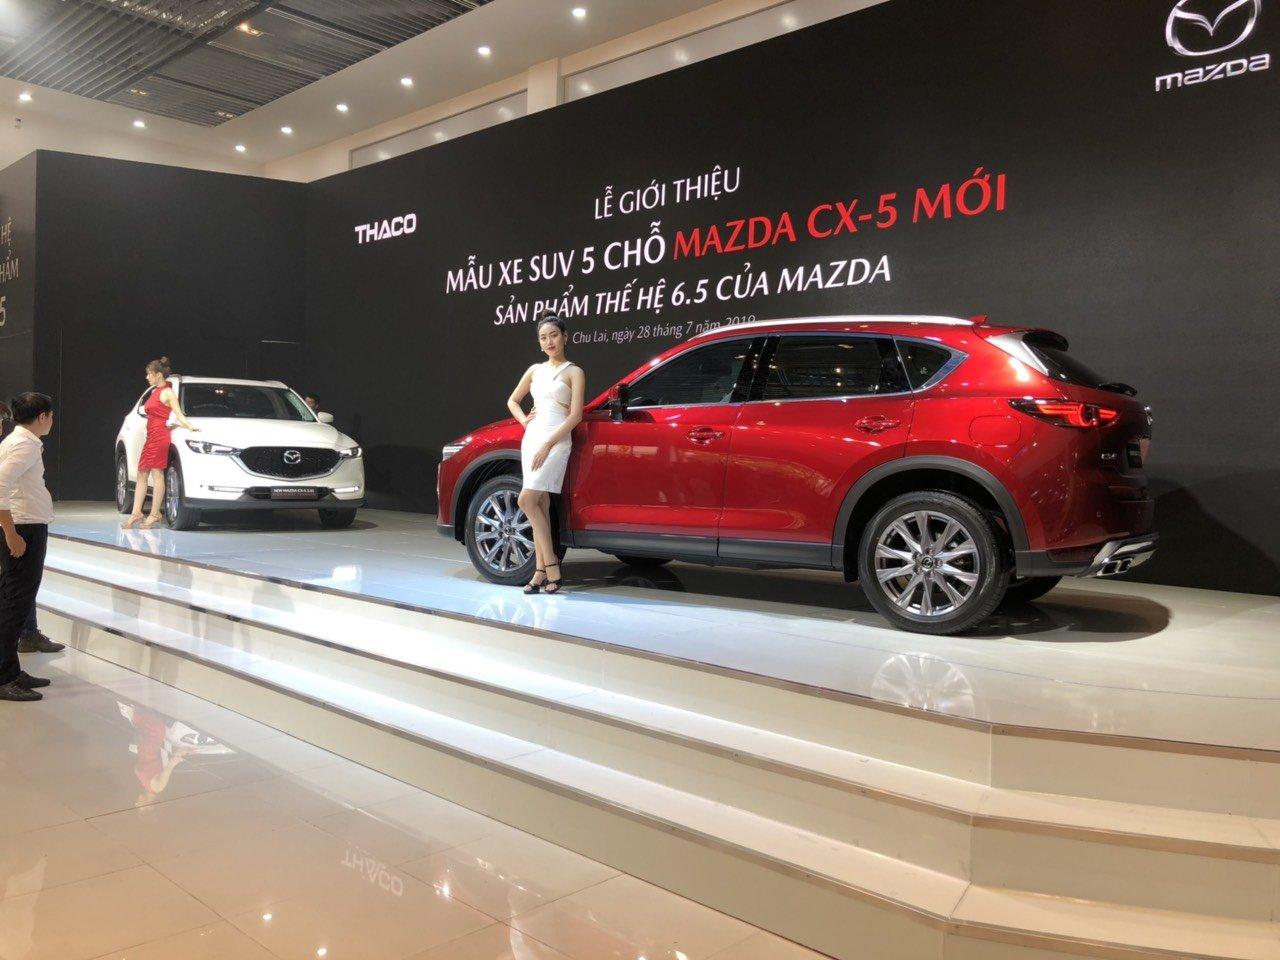 Ảnh Mazda CX-5 2019 Việt Nam